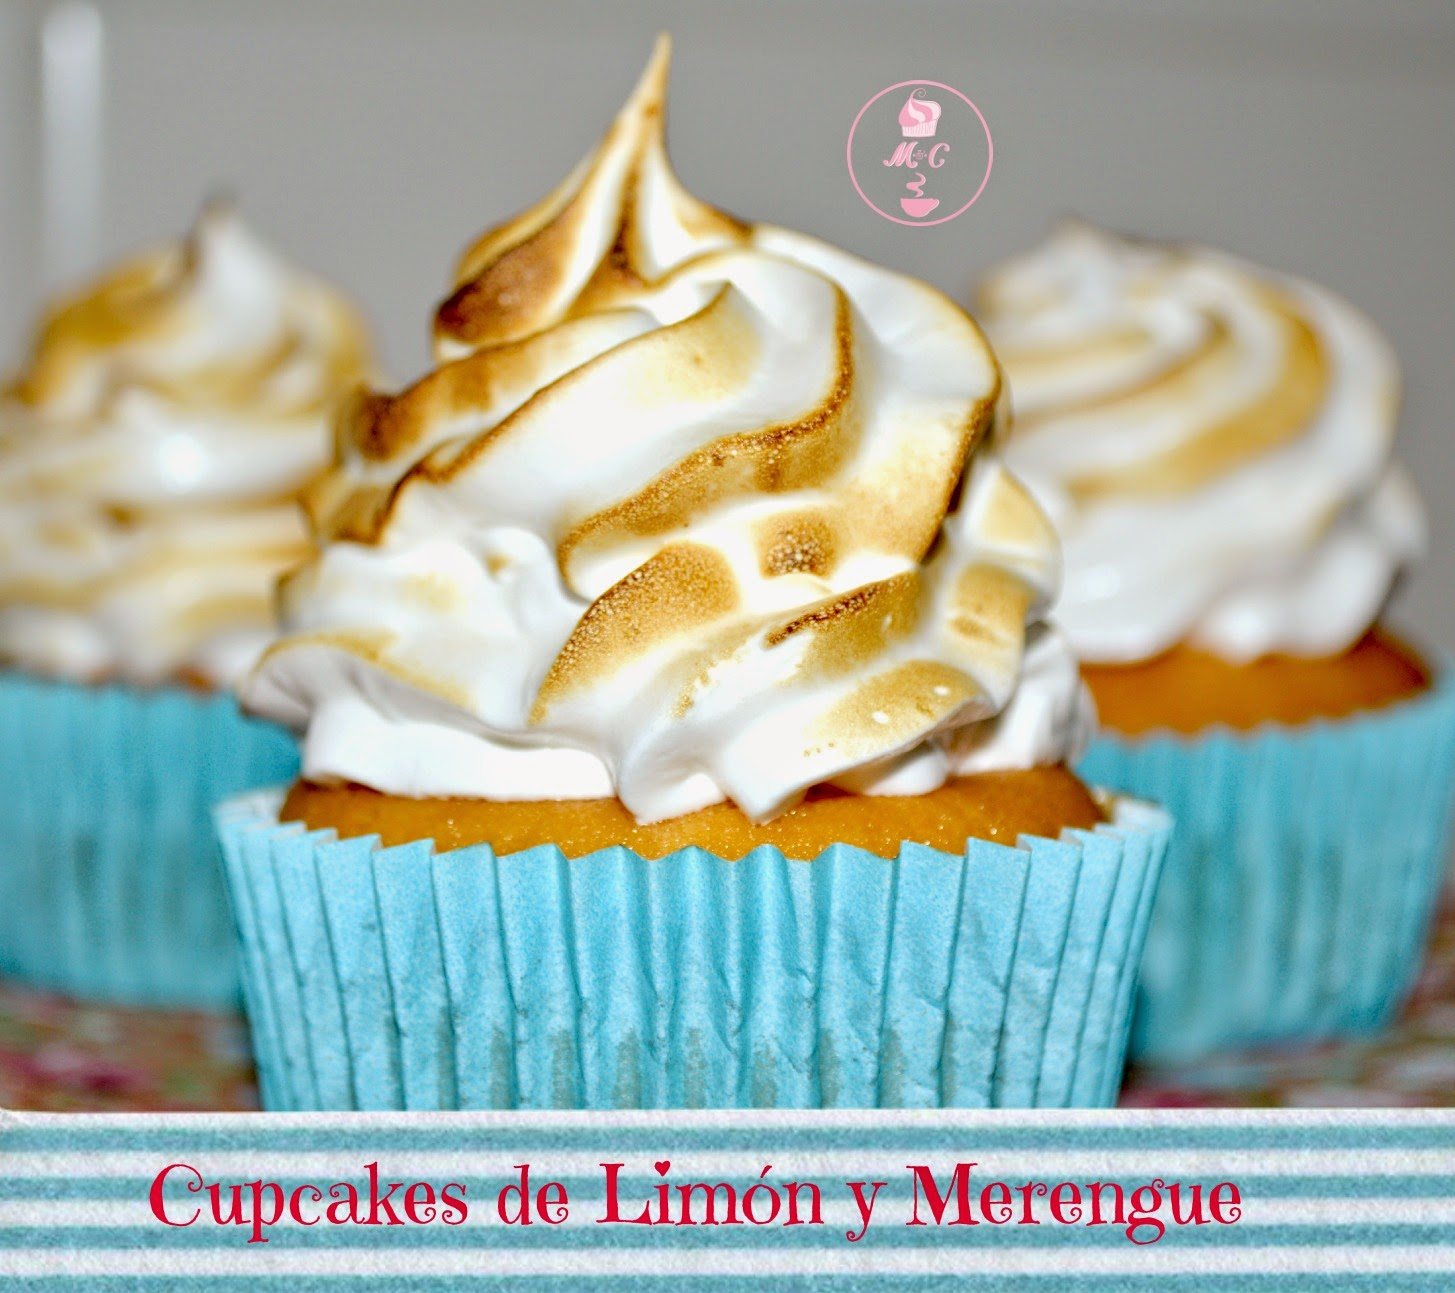 cupcakes de meregue